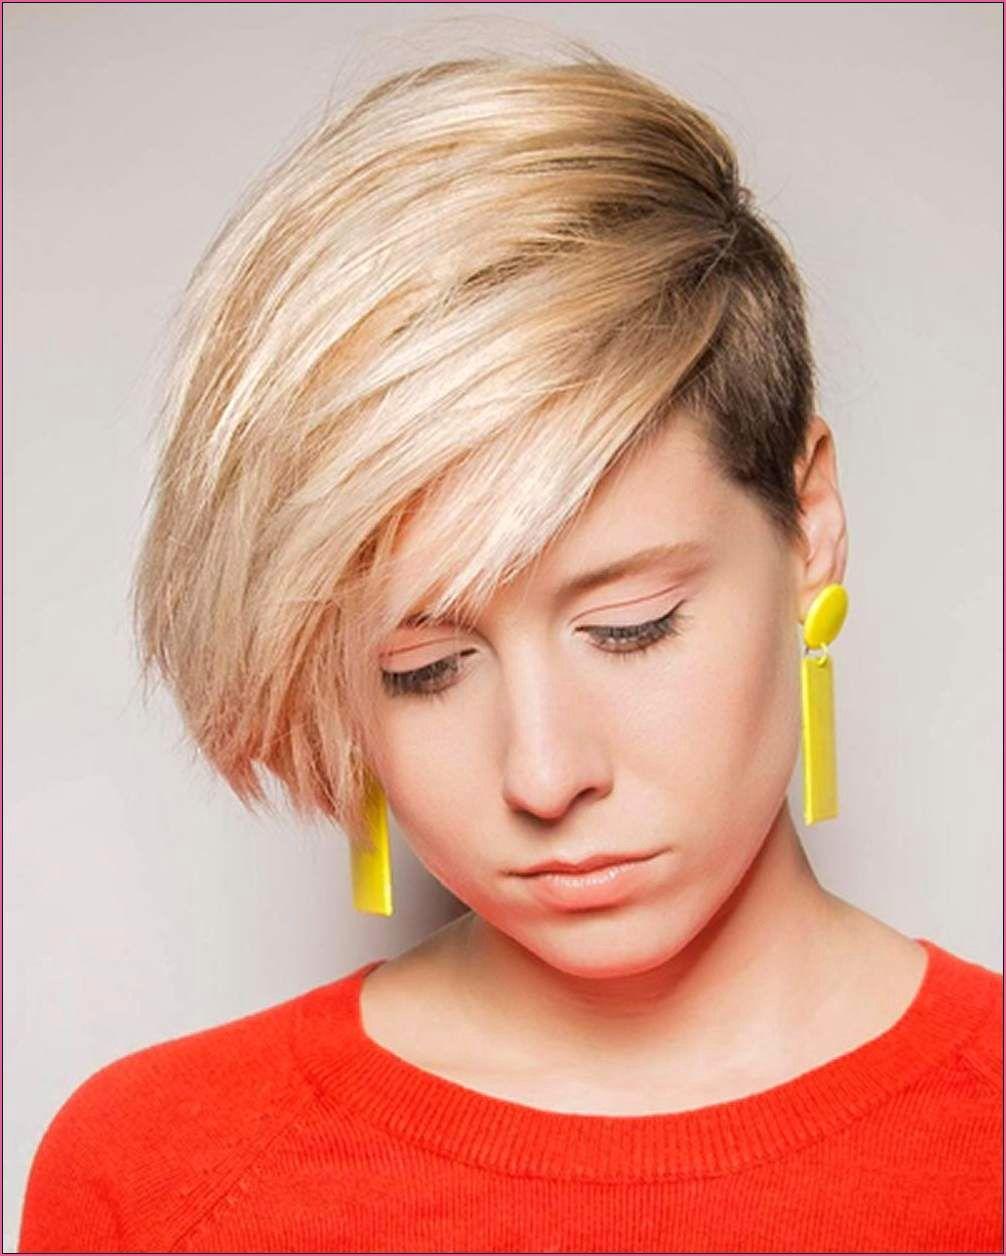 Nett Valentina Pahde Neue Frisur Kurzhaarfrisuren Frisur Wenig Haare Stufenschnitt Lange Haare